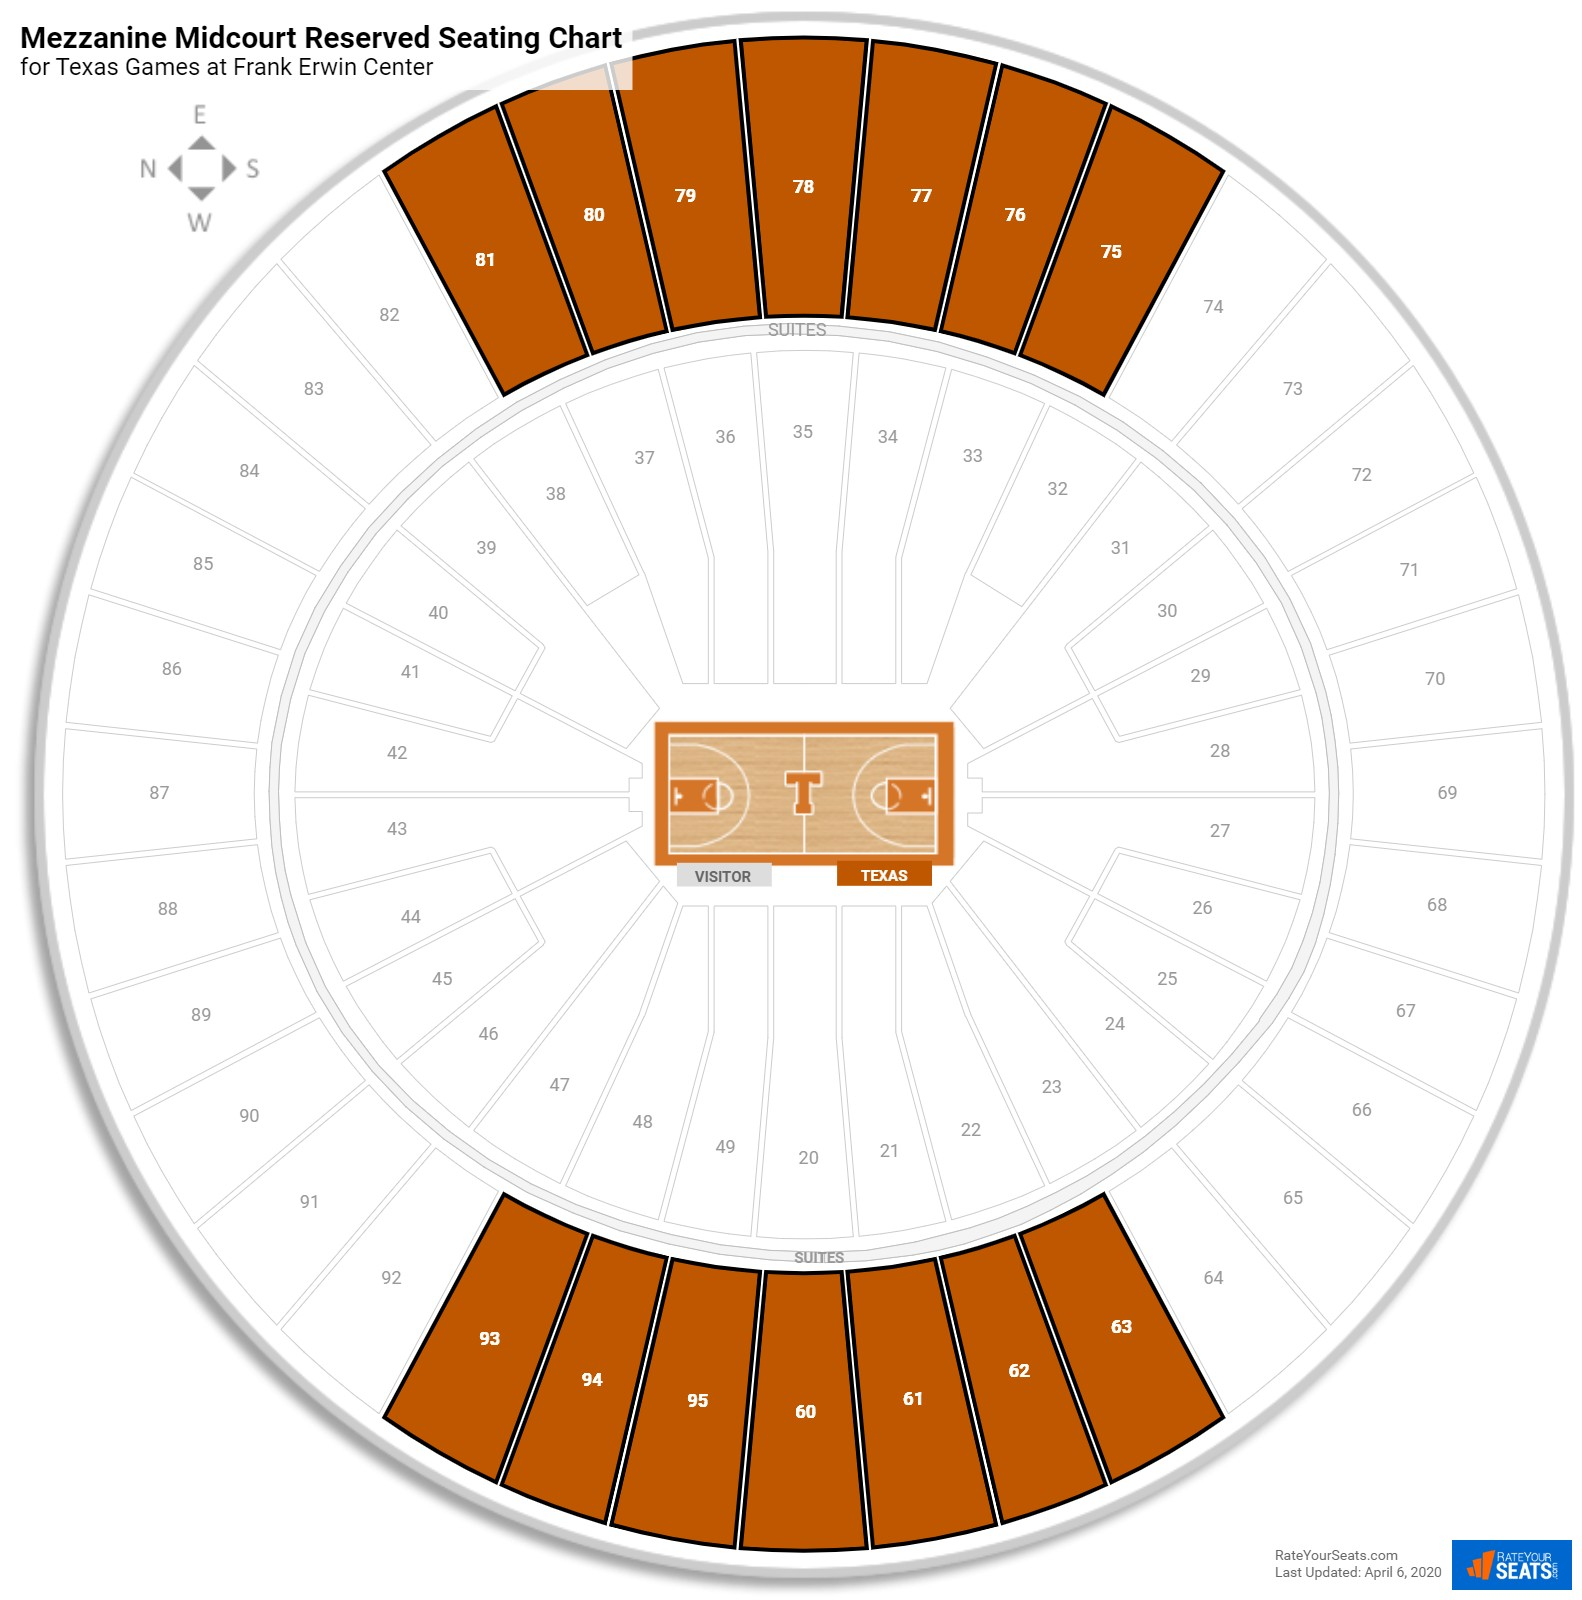 Frank Erwin Center Mezzanine Midcourt Reserved Seating Chart